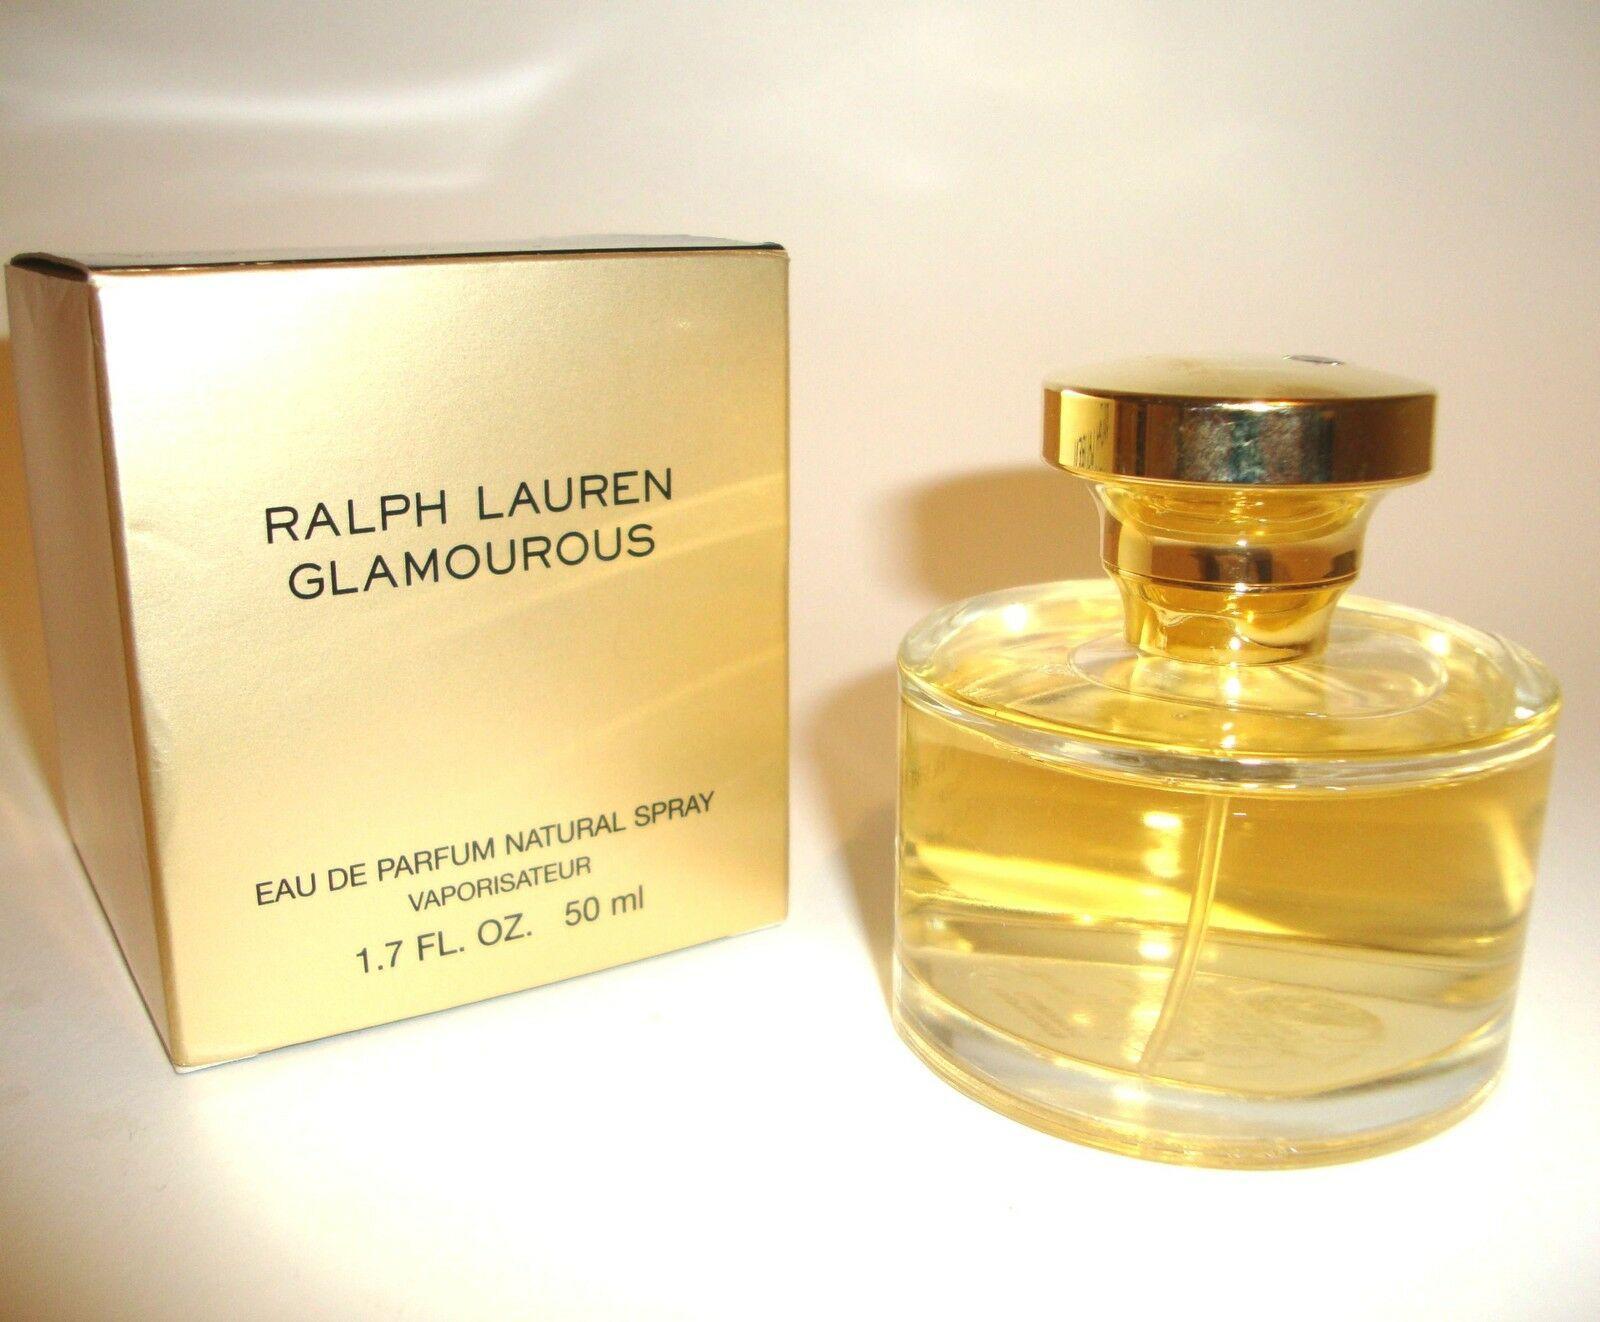 Aaaaaaralph lauren glamourous 1.7 oz perfume